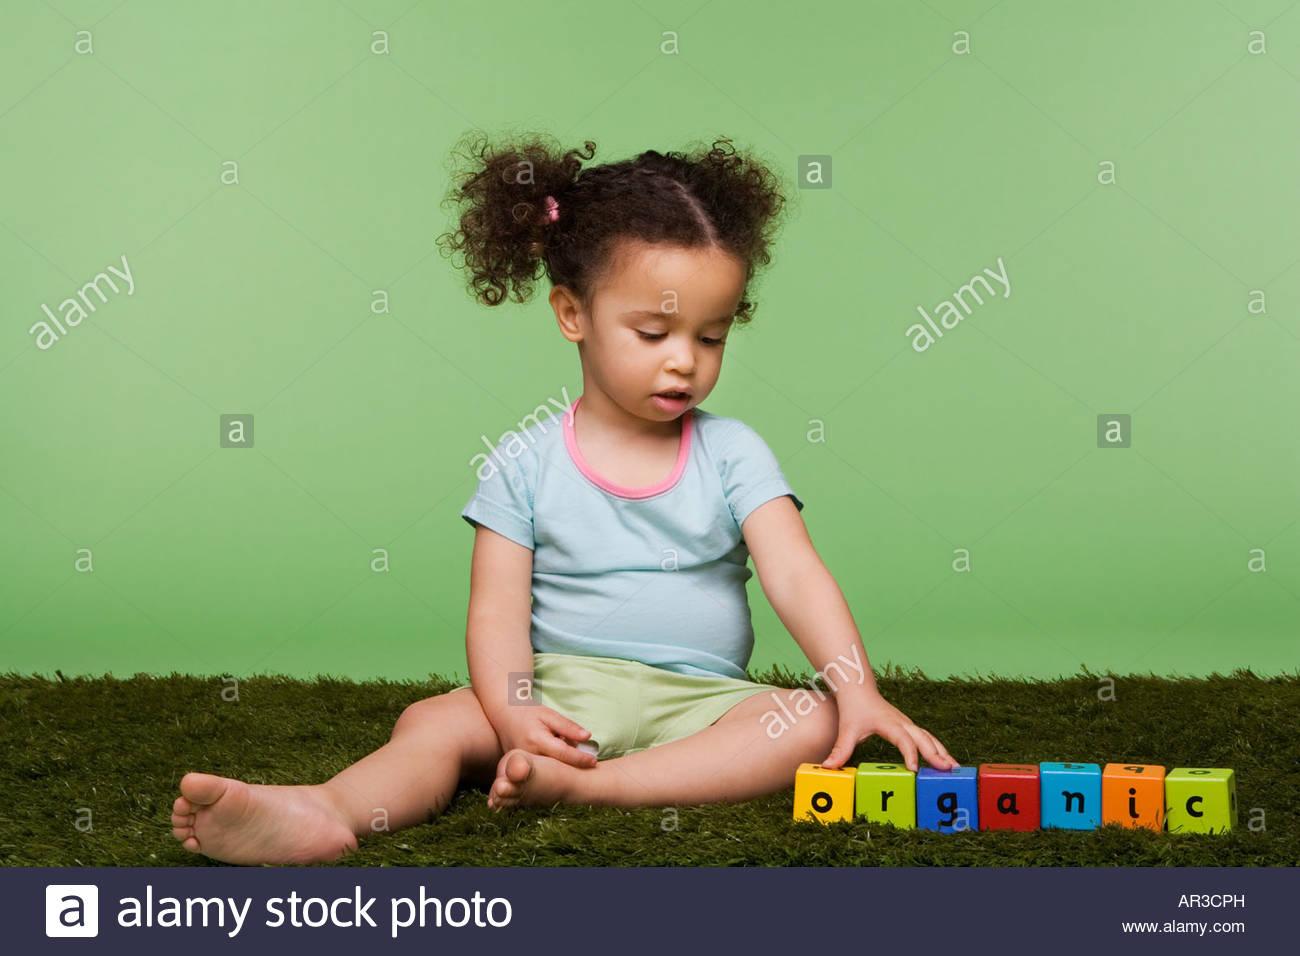 Girl with building blocks spelling organic - Stock Image